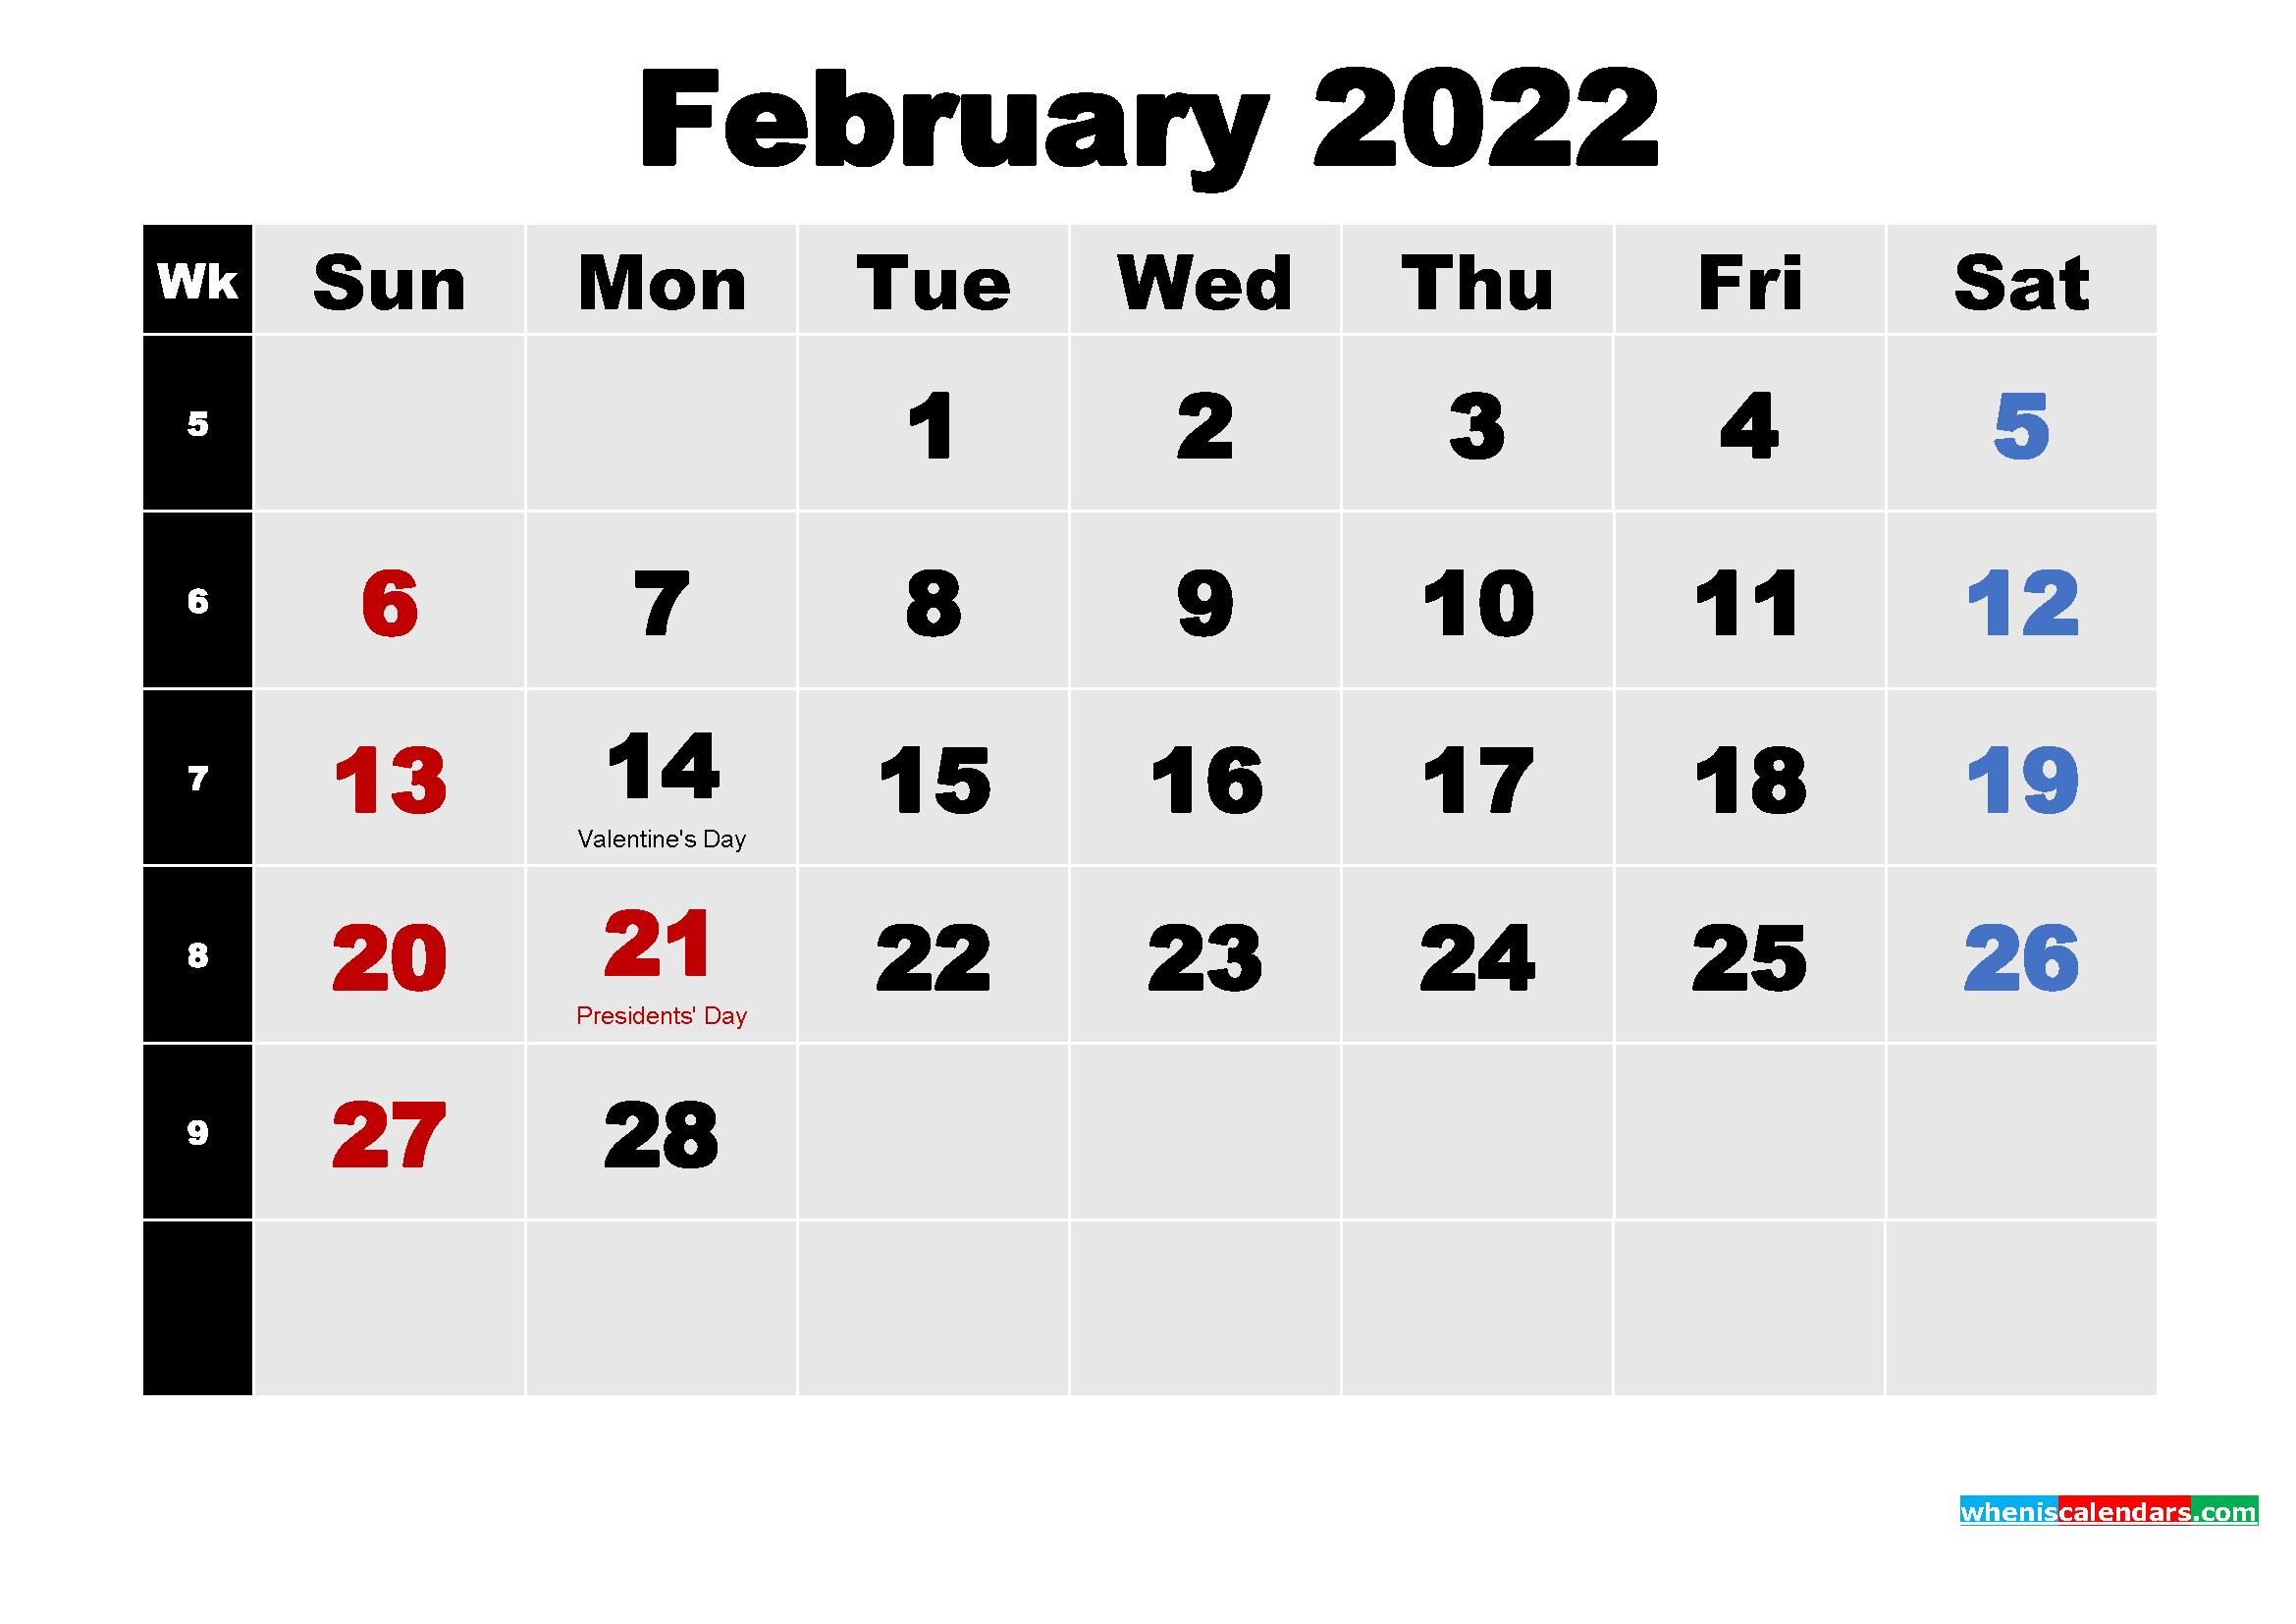 February 2022 Calendar with Holidays Wallpaper